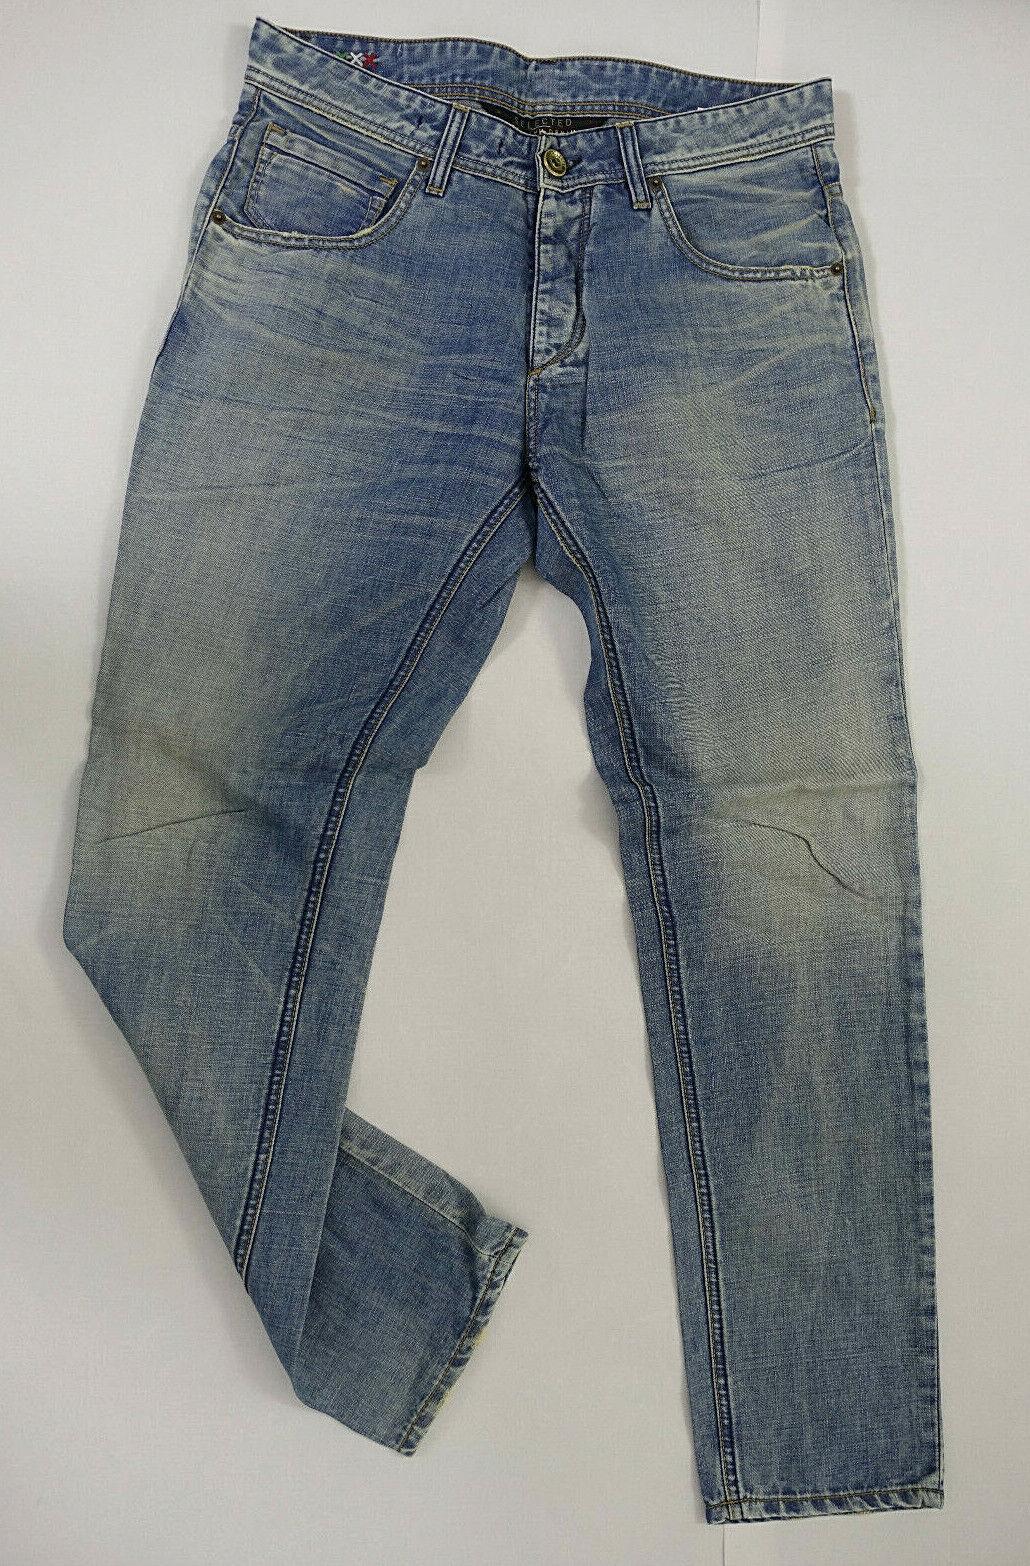 NEU - SELECTED Premium Denim Herren Jeans W32 L32 Style Oscar Regular Carrot Fit    Clever und praktisch